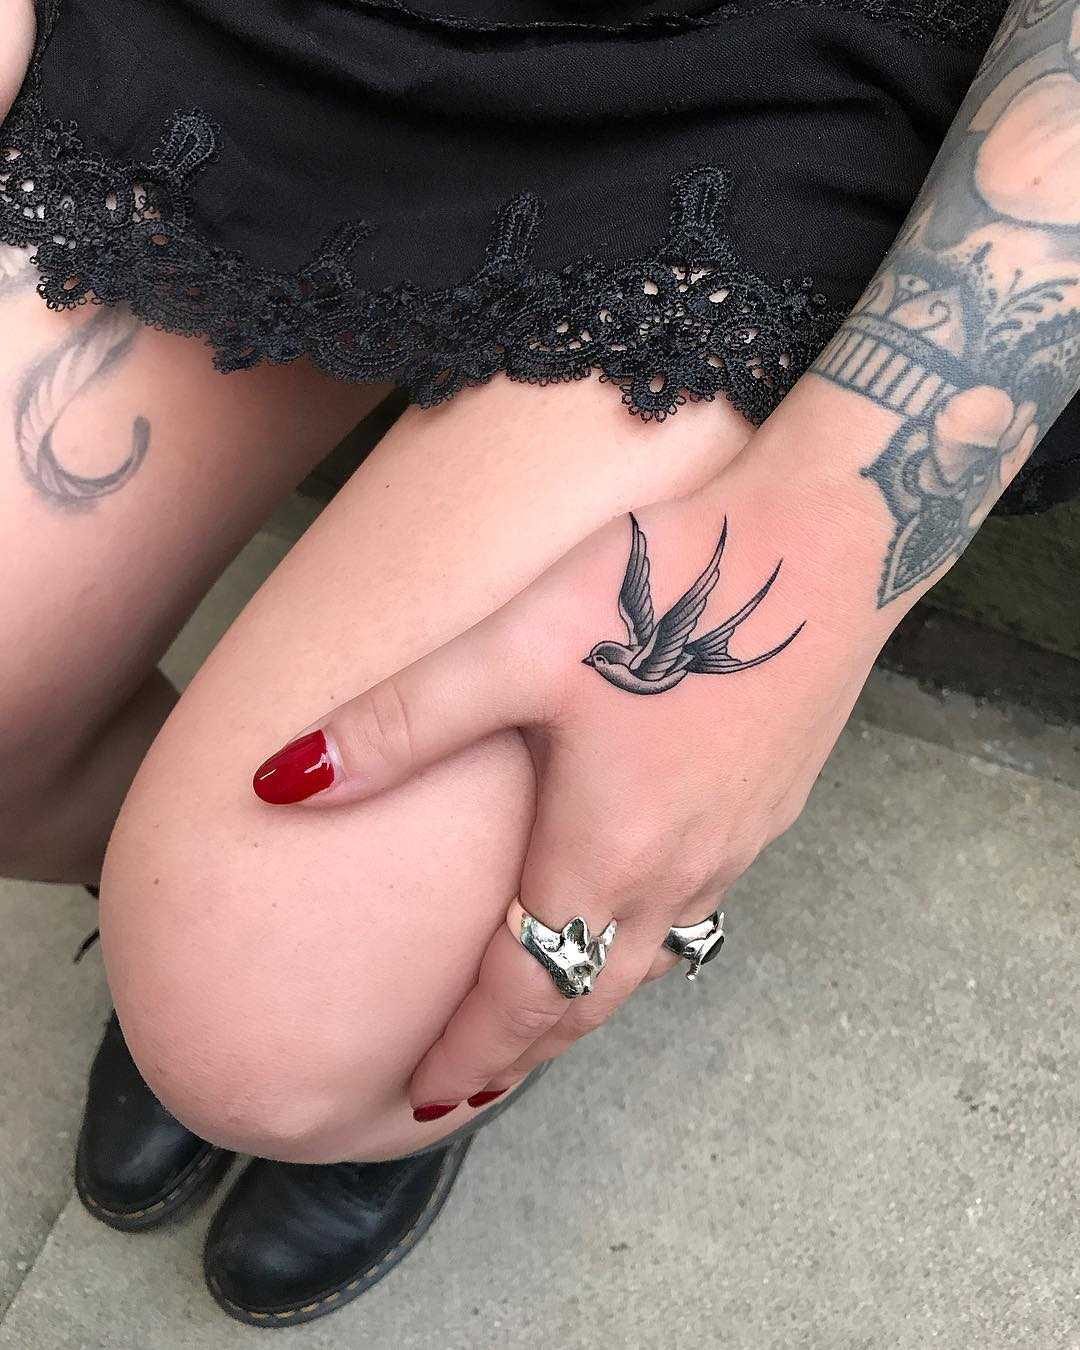 Tiny swallow on a hand by Matt Stopps